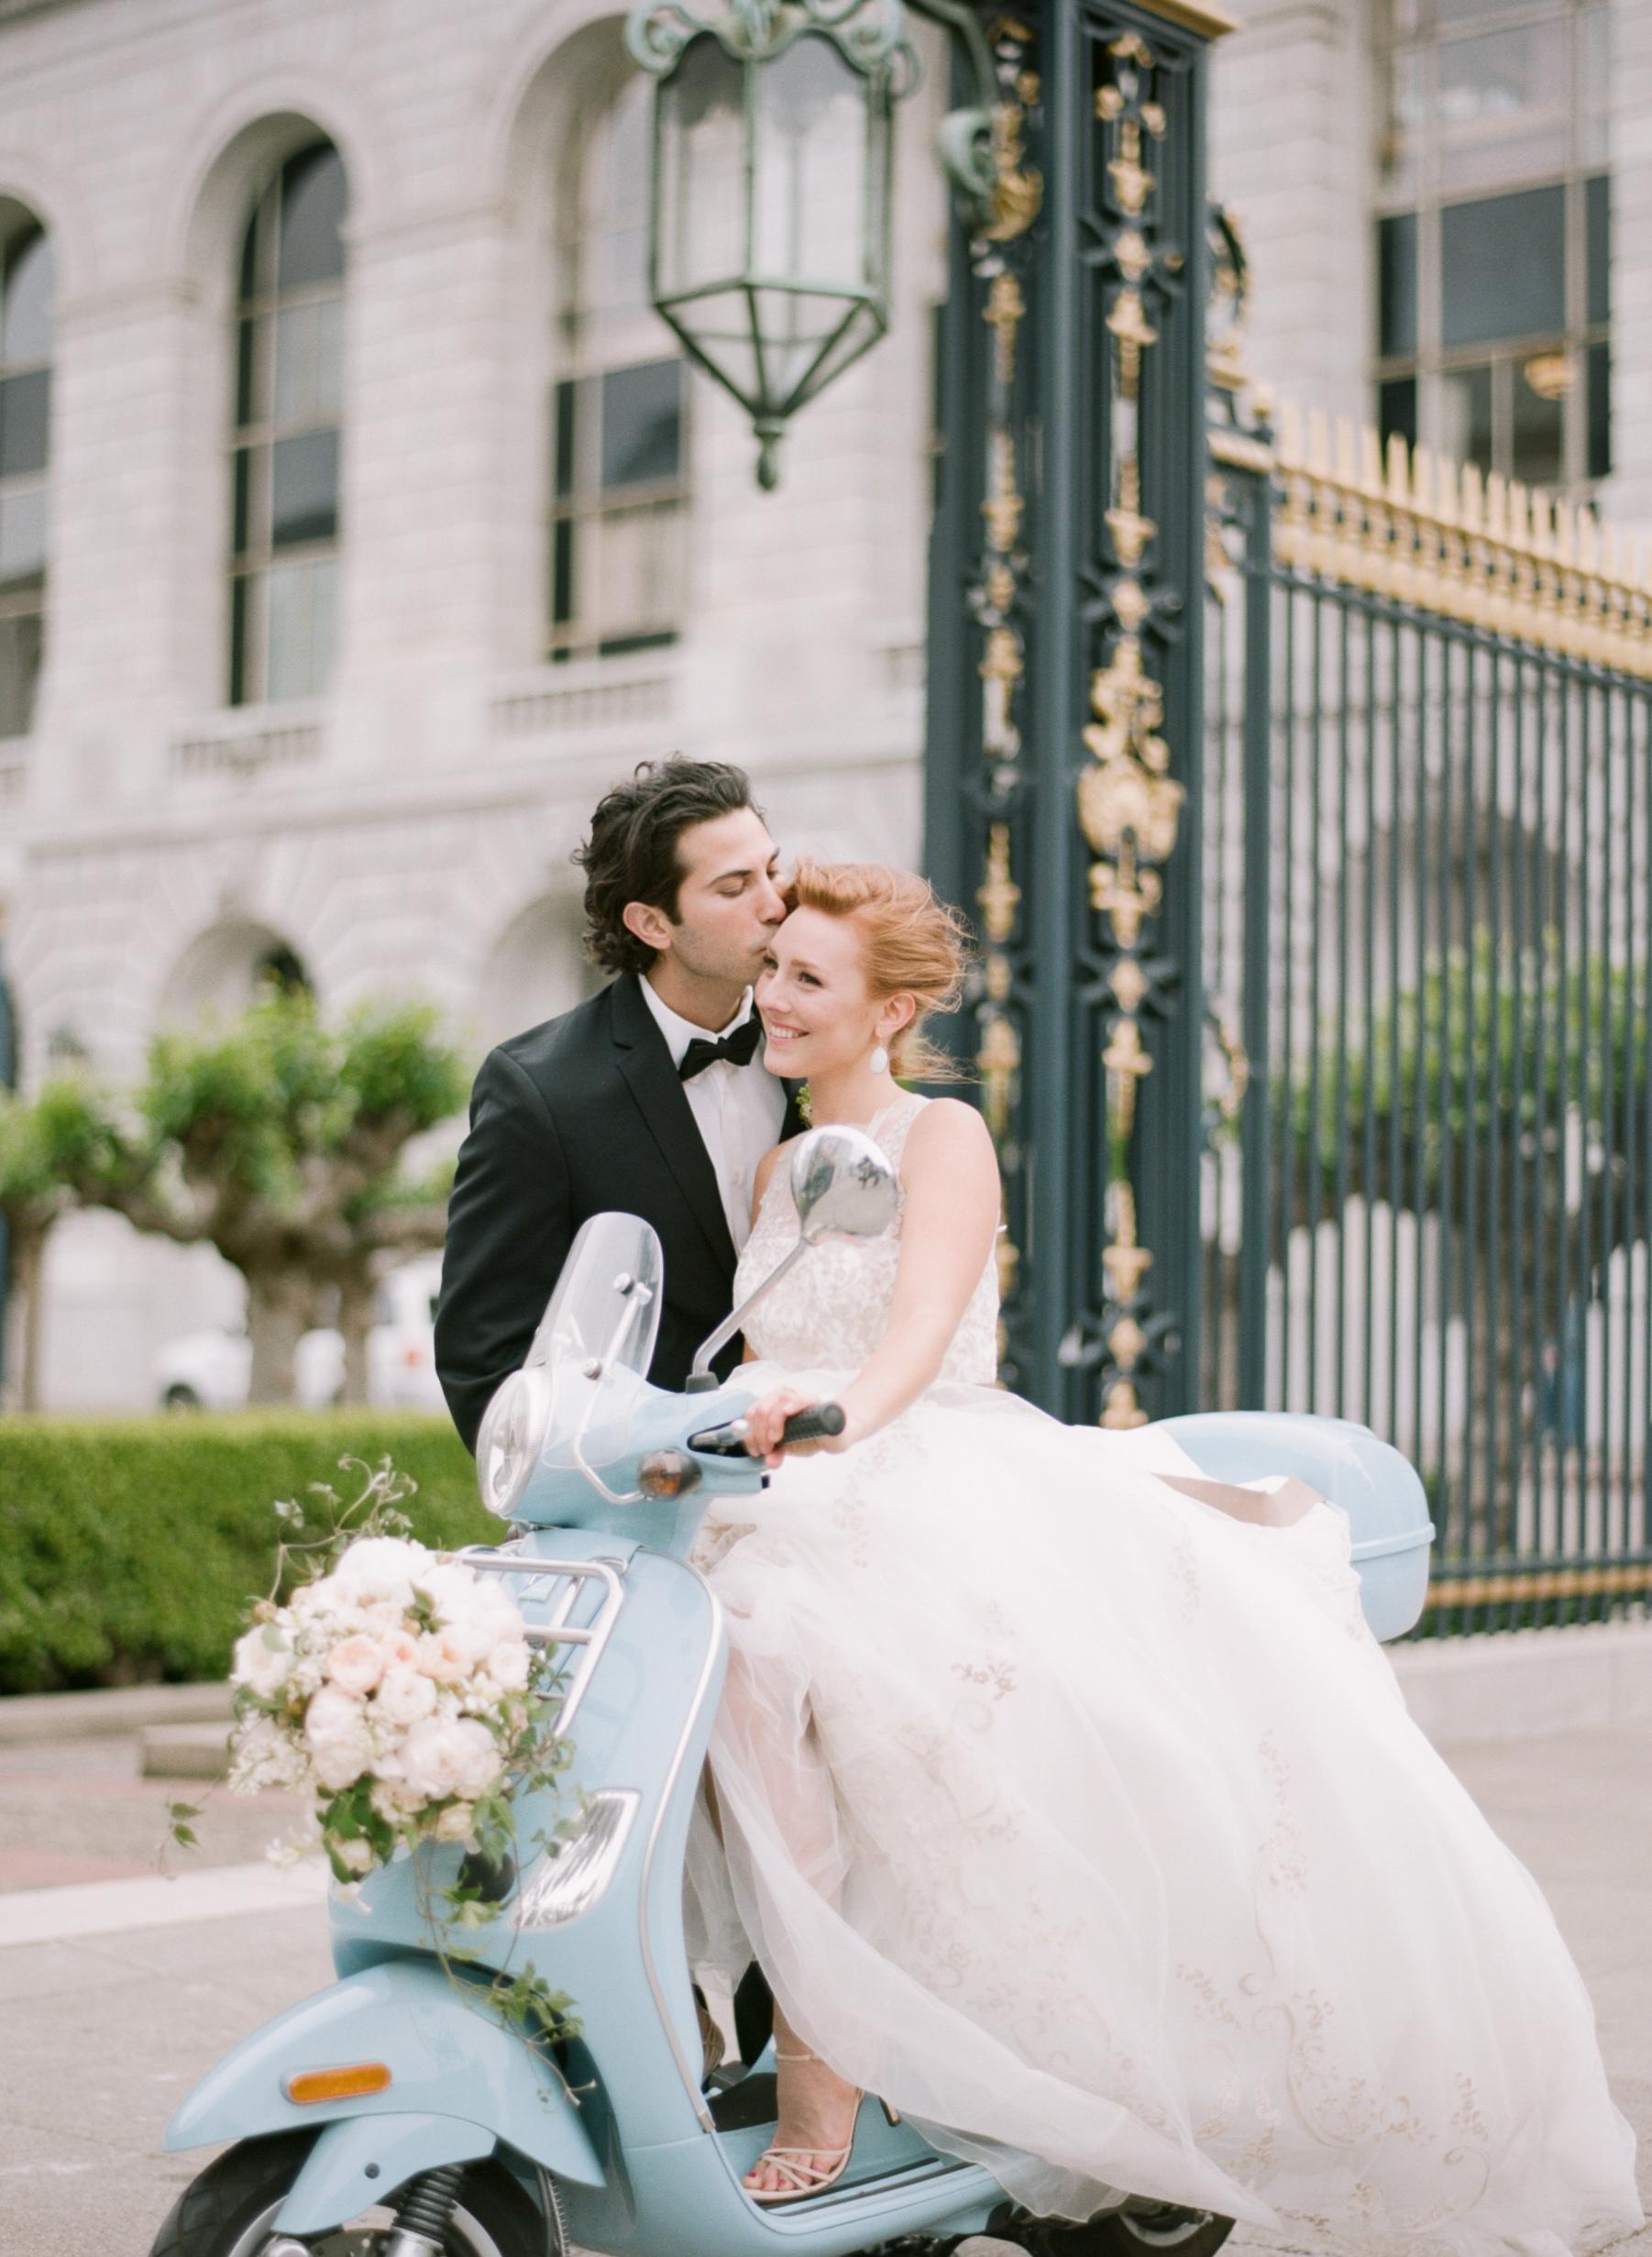 044-80840026SylvieGil-Paris-macaroons-red hair bride-romantic wedding-french wedding.jpg